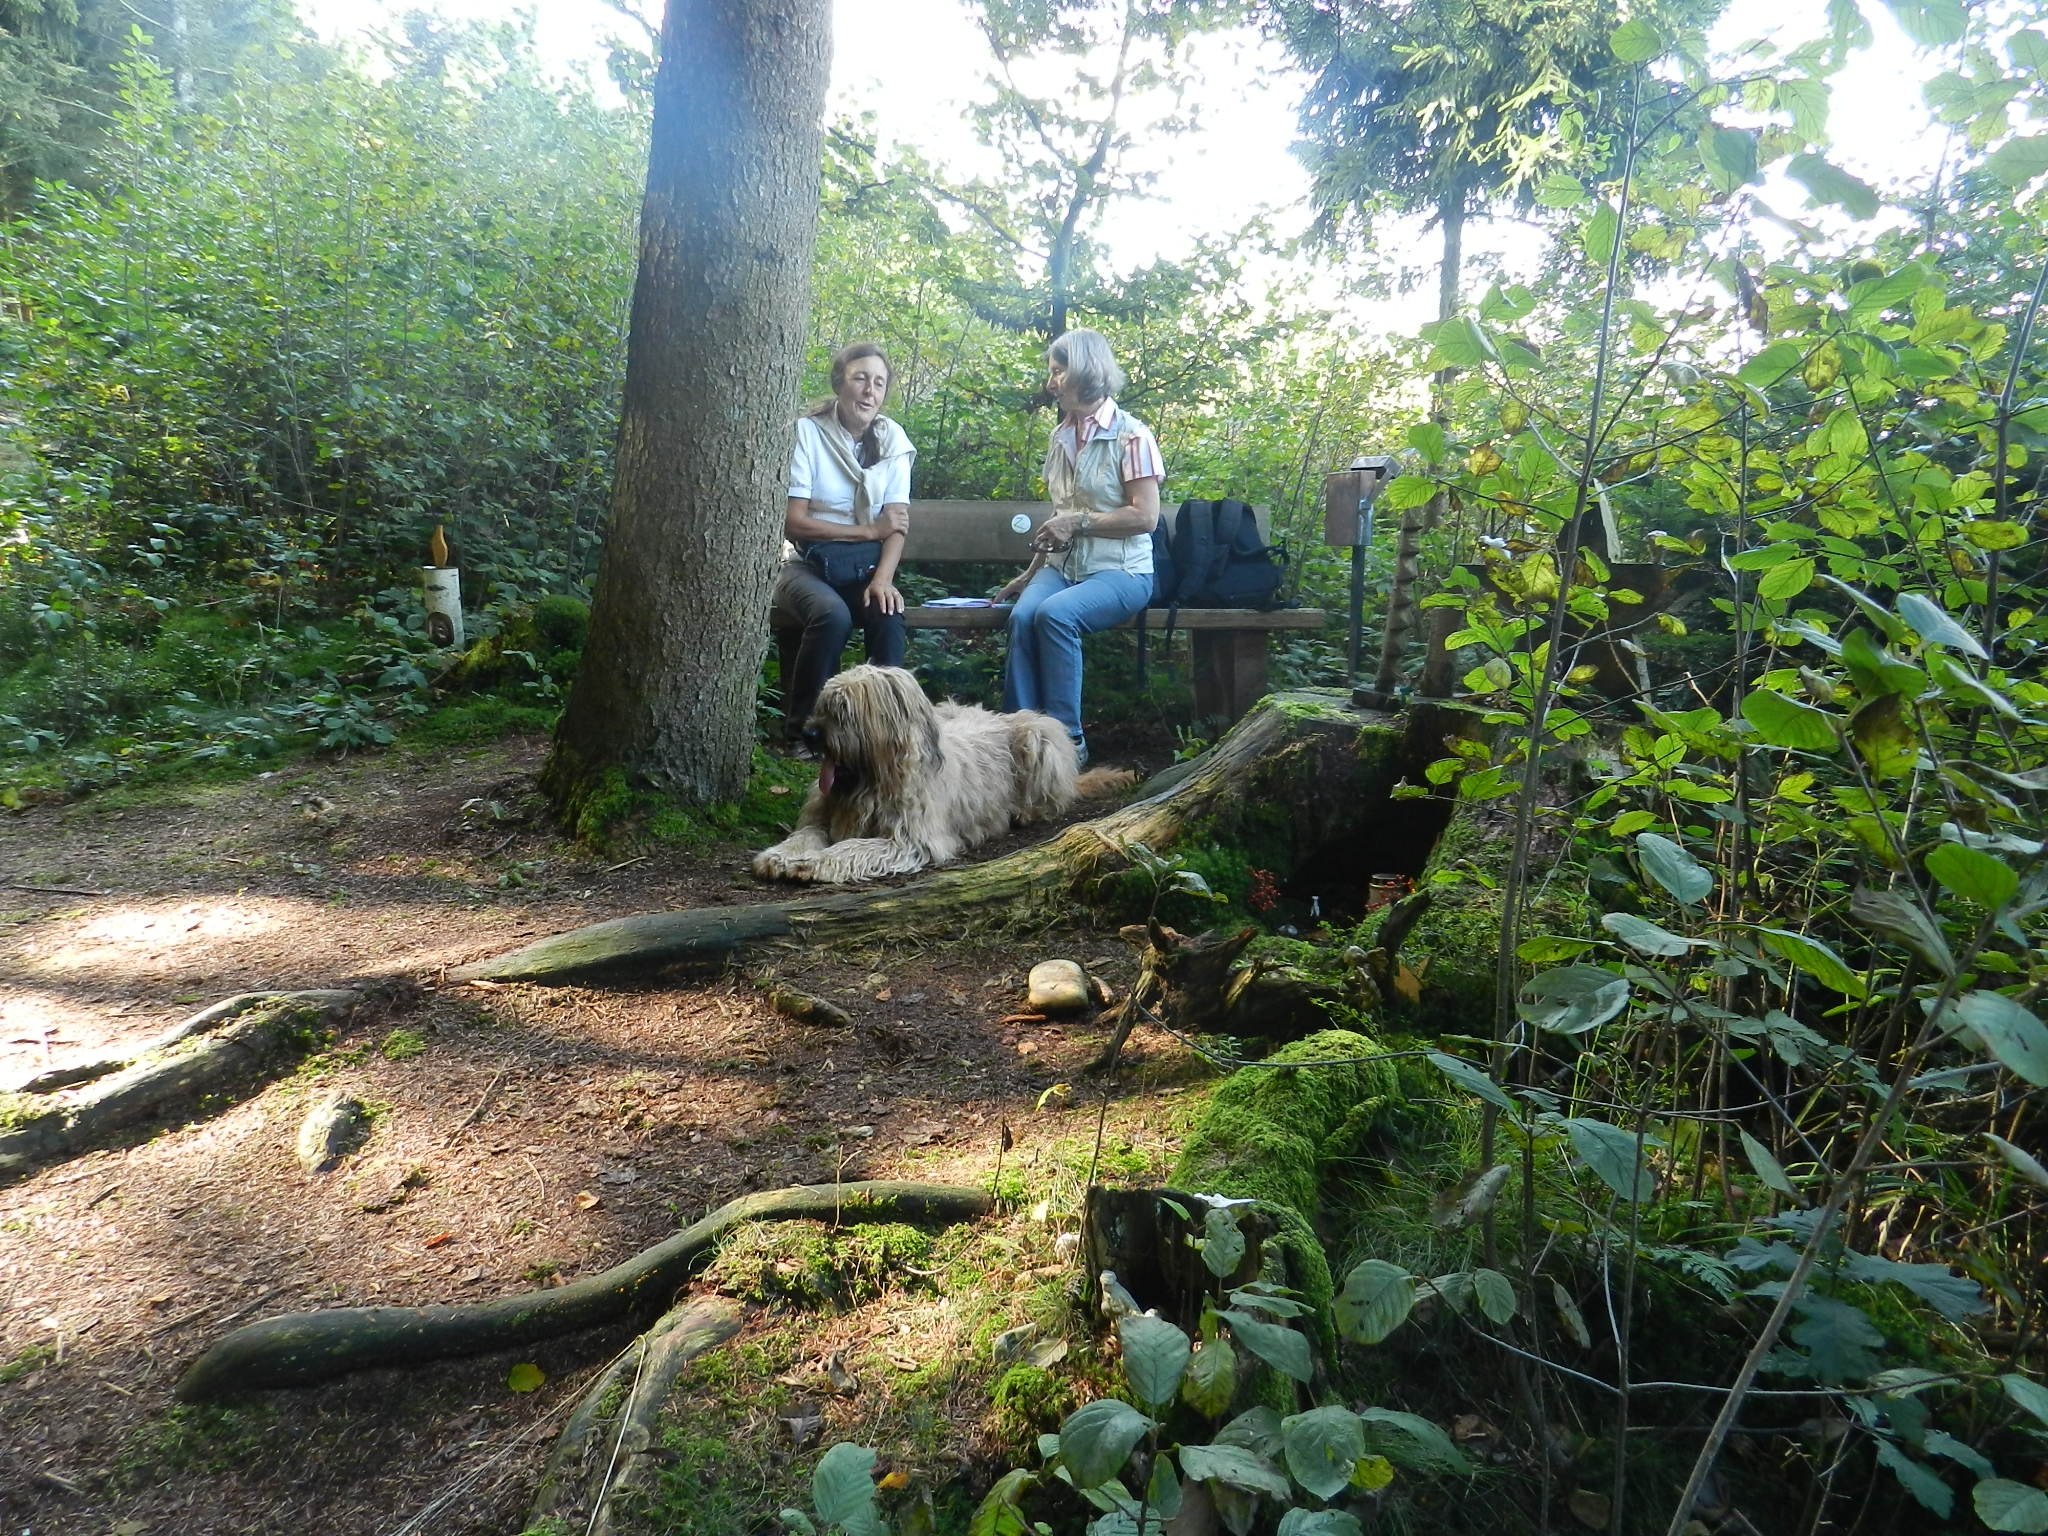 Rast beim Waldkriperl